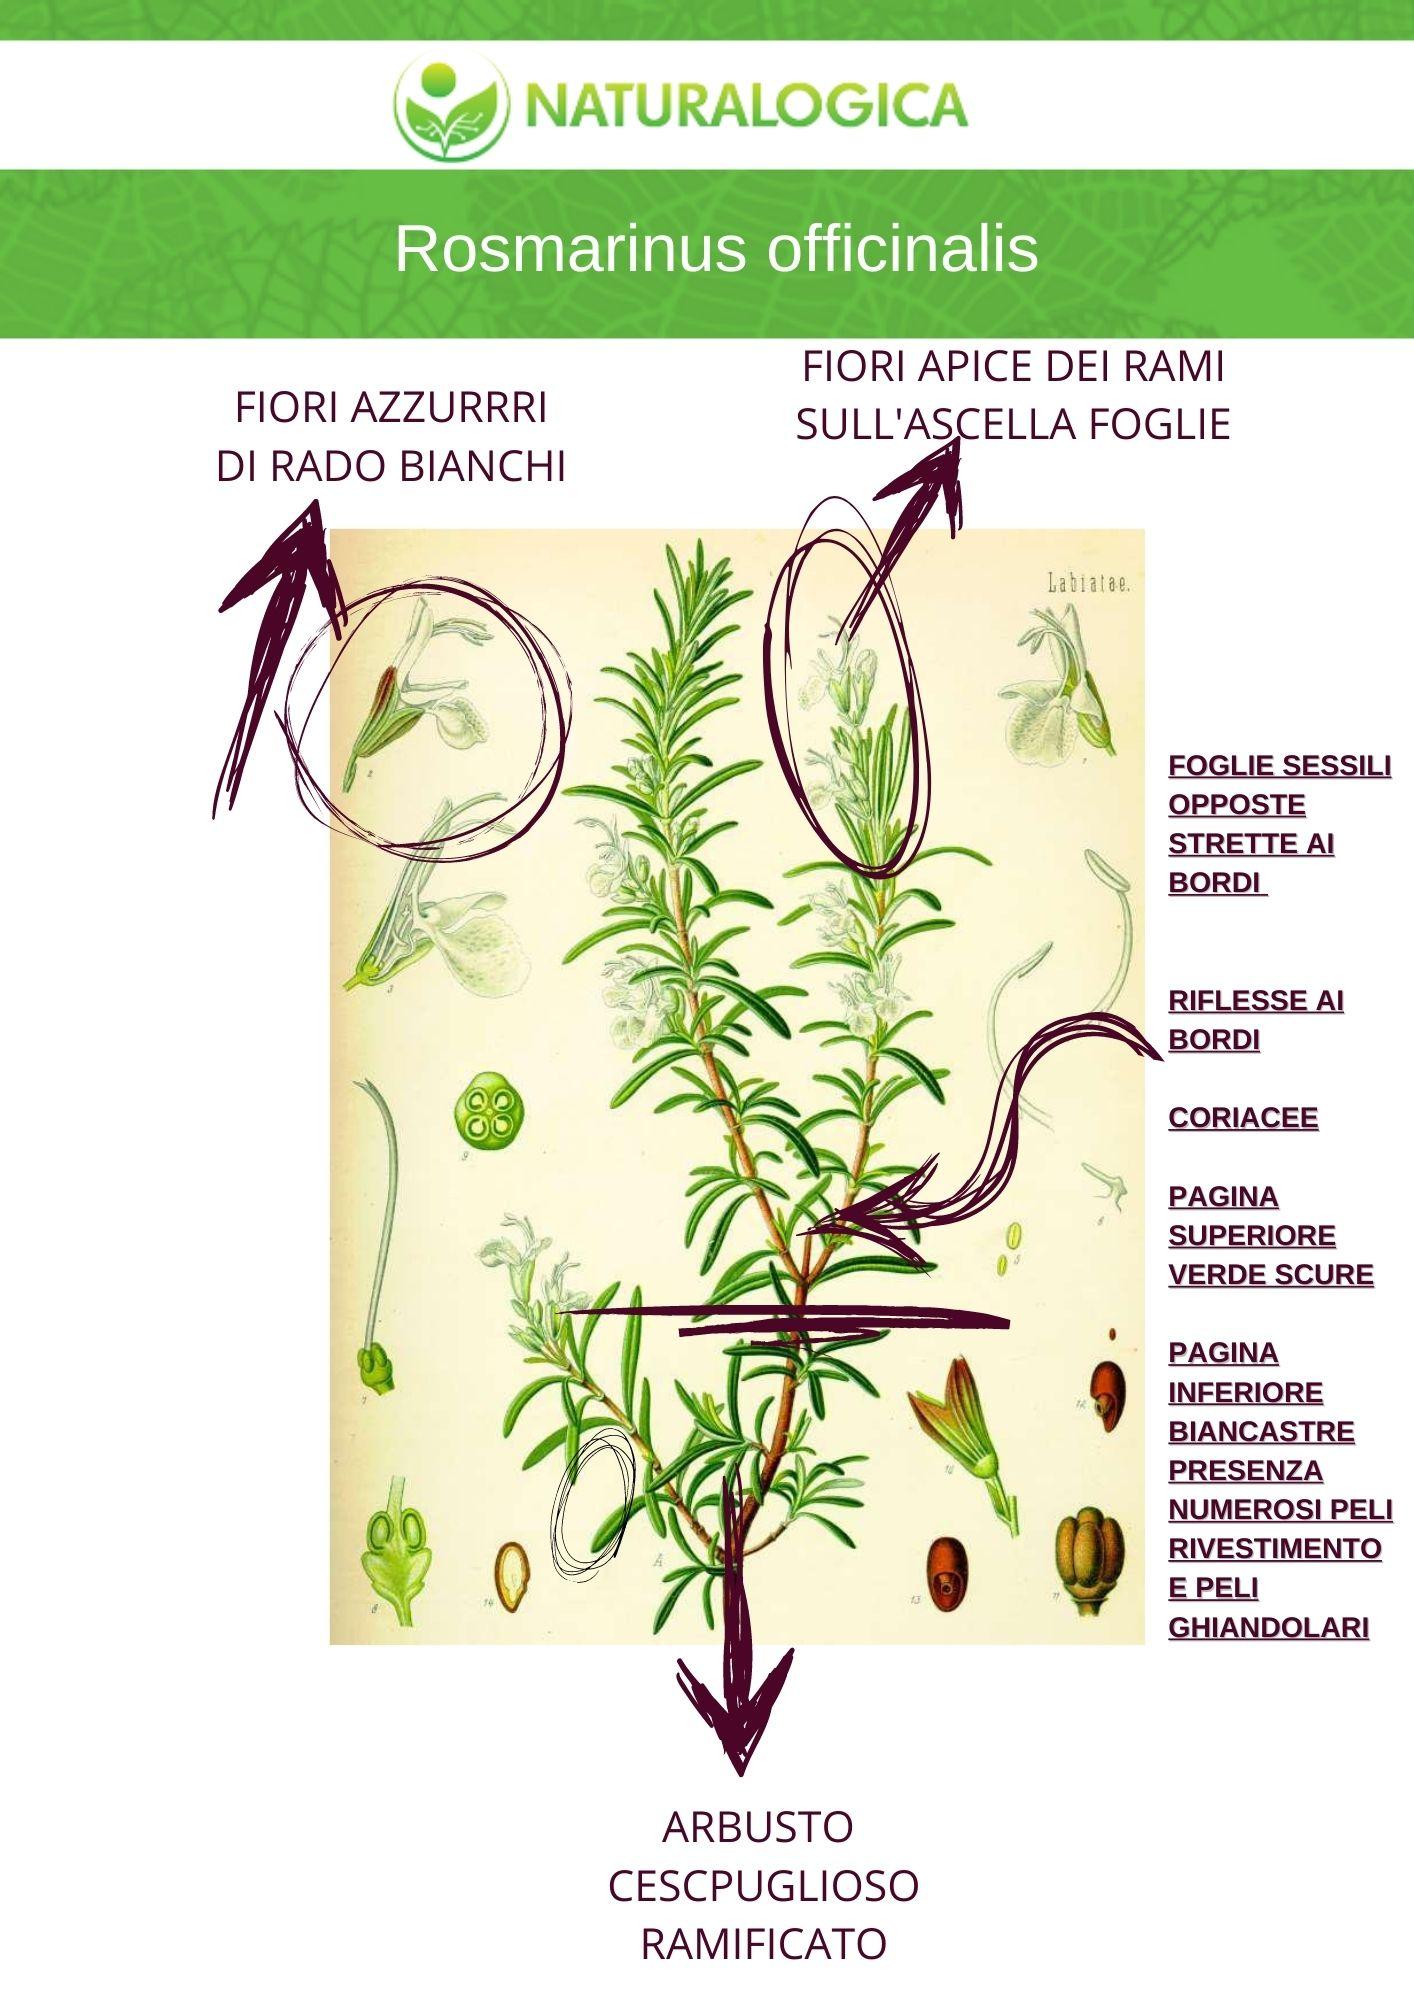 Scheda botanica farmaceutica